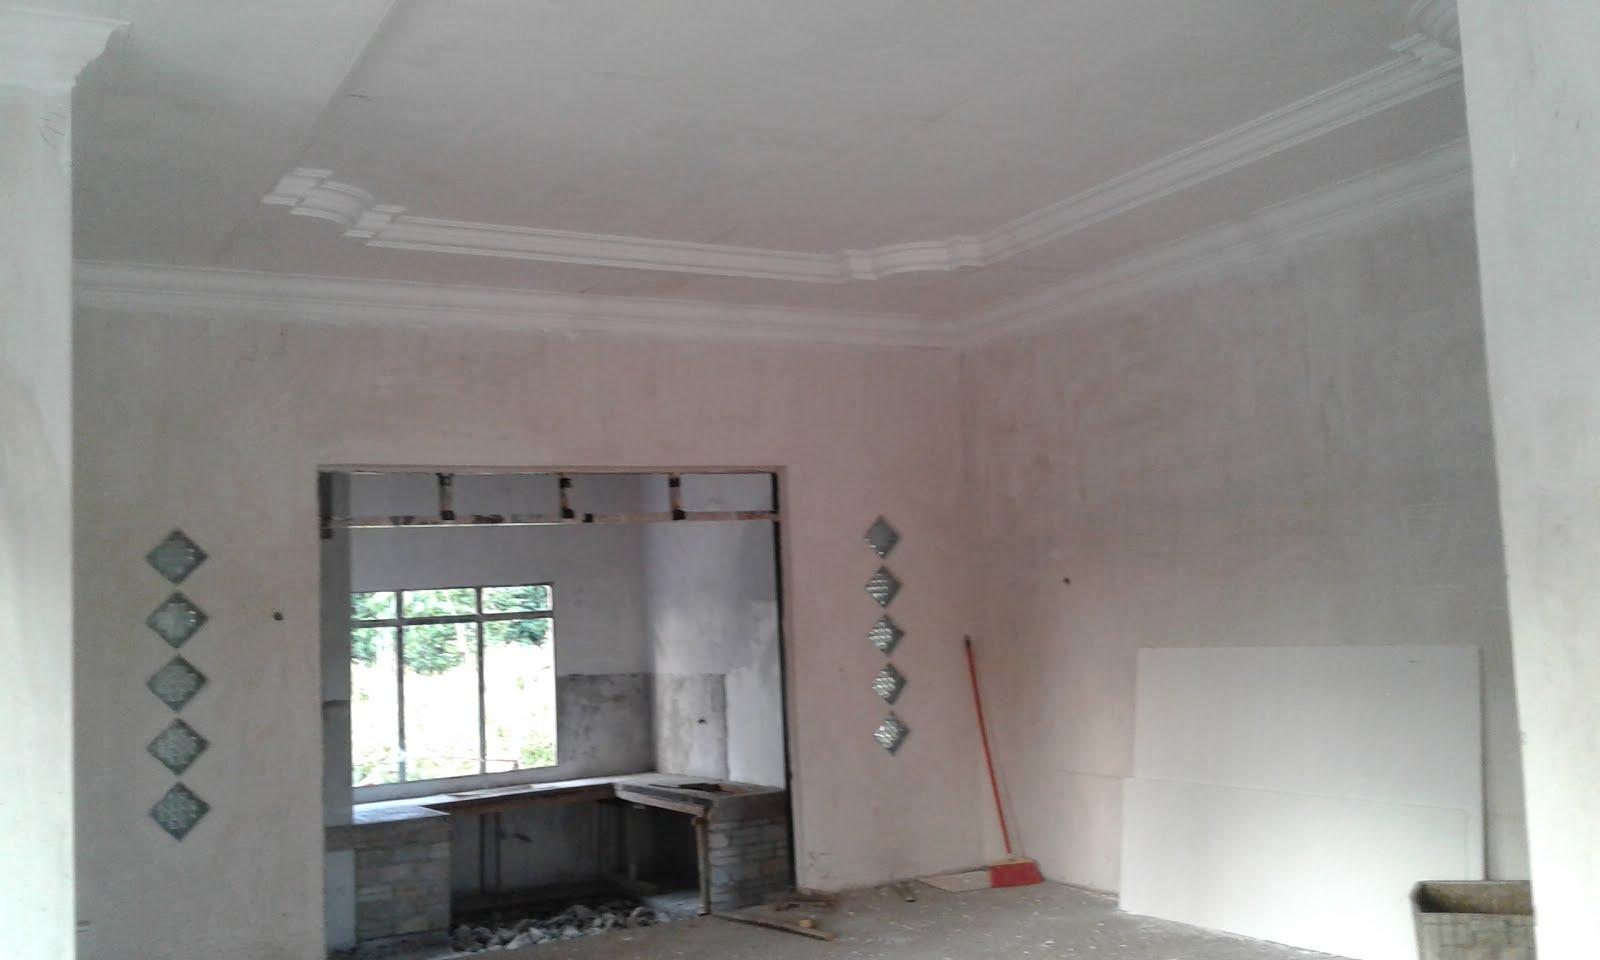 Berikut Adalah Syiling Kapur Dan Cornish Yang Dipasang Pada Ruang Tamu Kami Setelah Tawar Menawar Membayar Rm1550 Untuk Keluasan Seluas 350